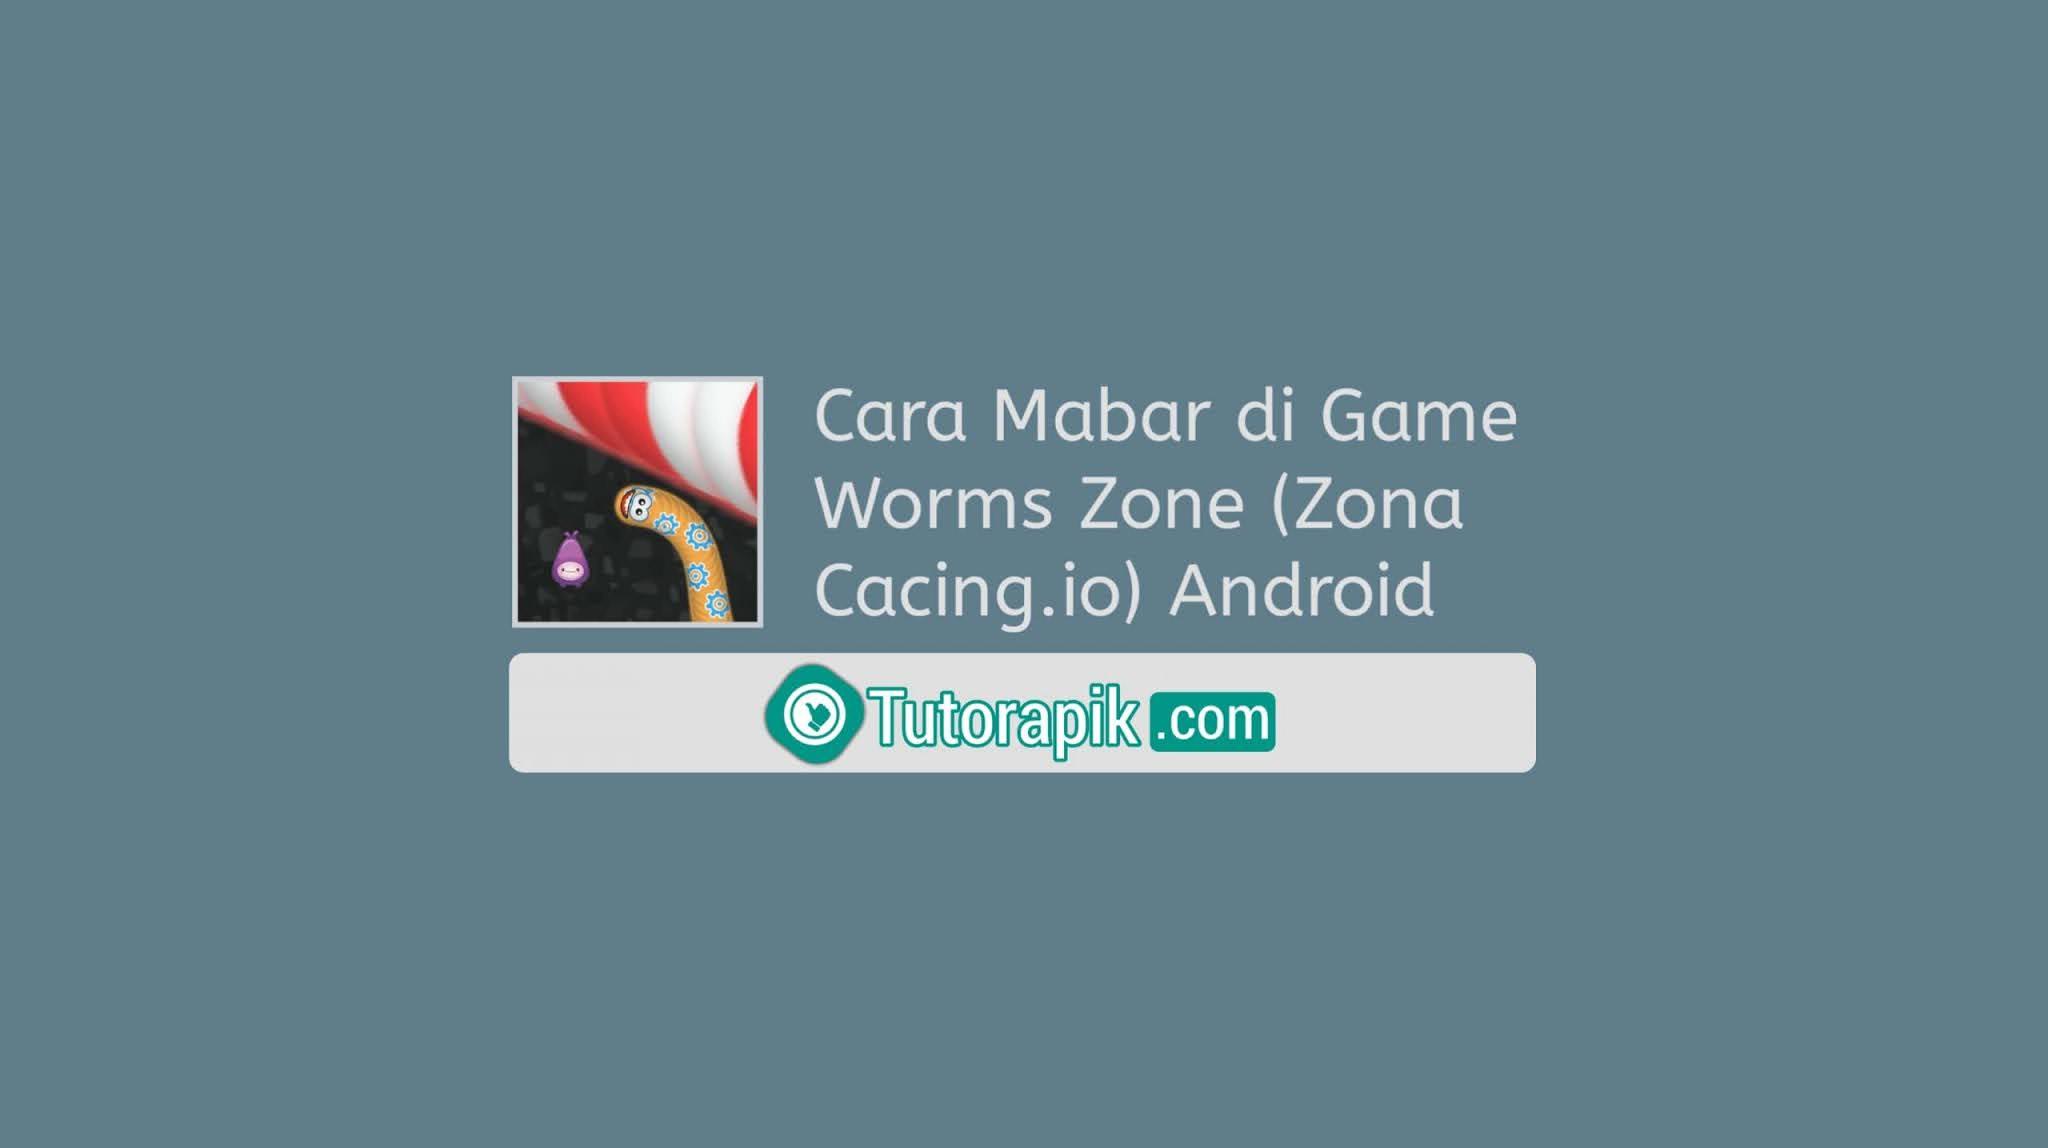 Cara Mabar di Game Worms Zone (Zona Cacing.io) Android